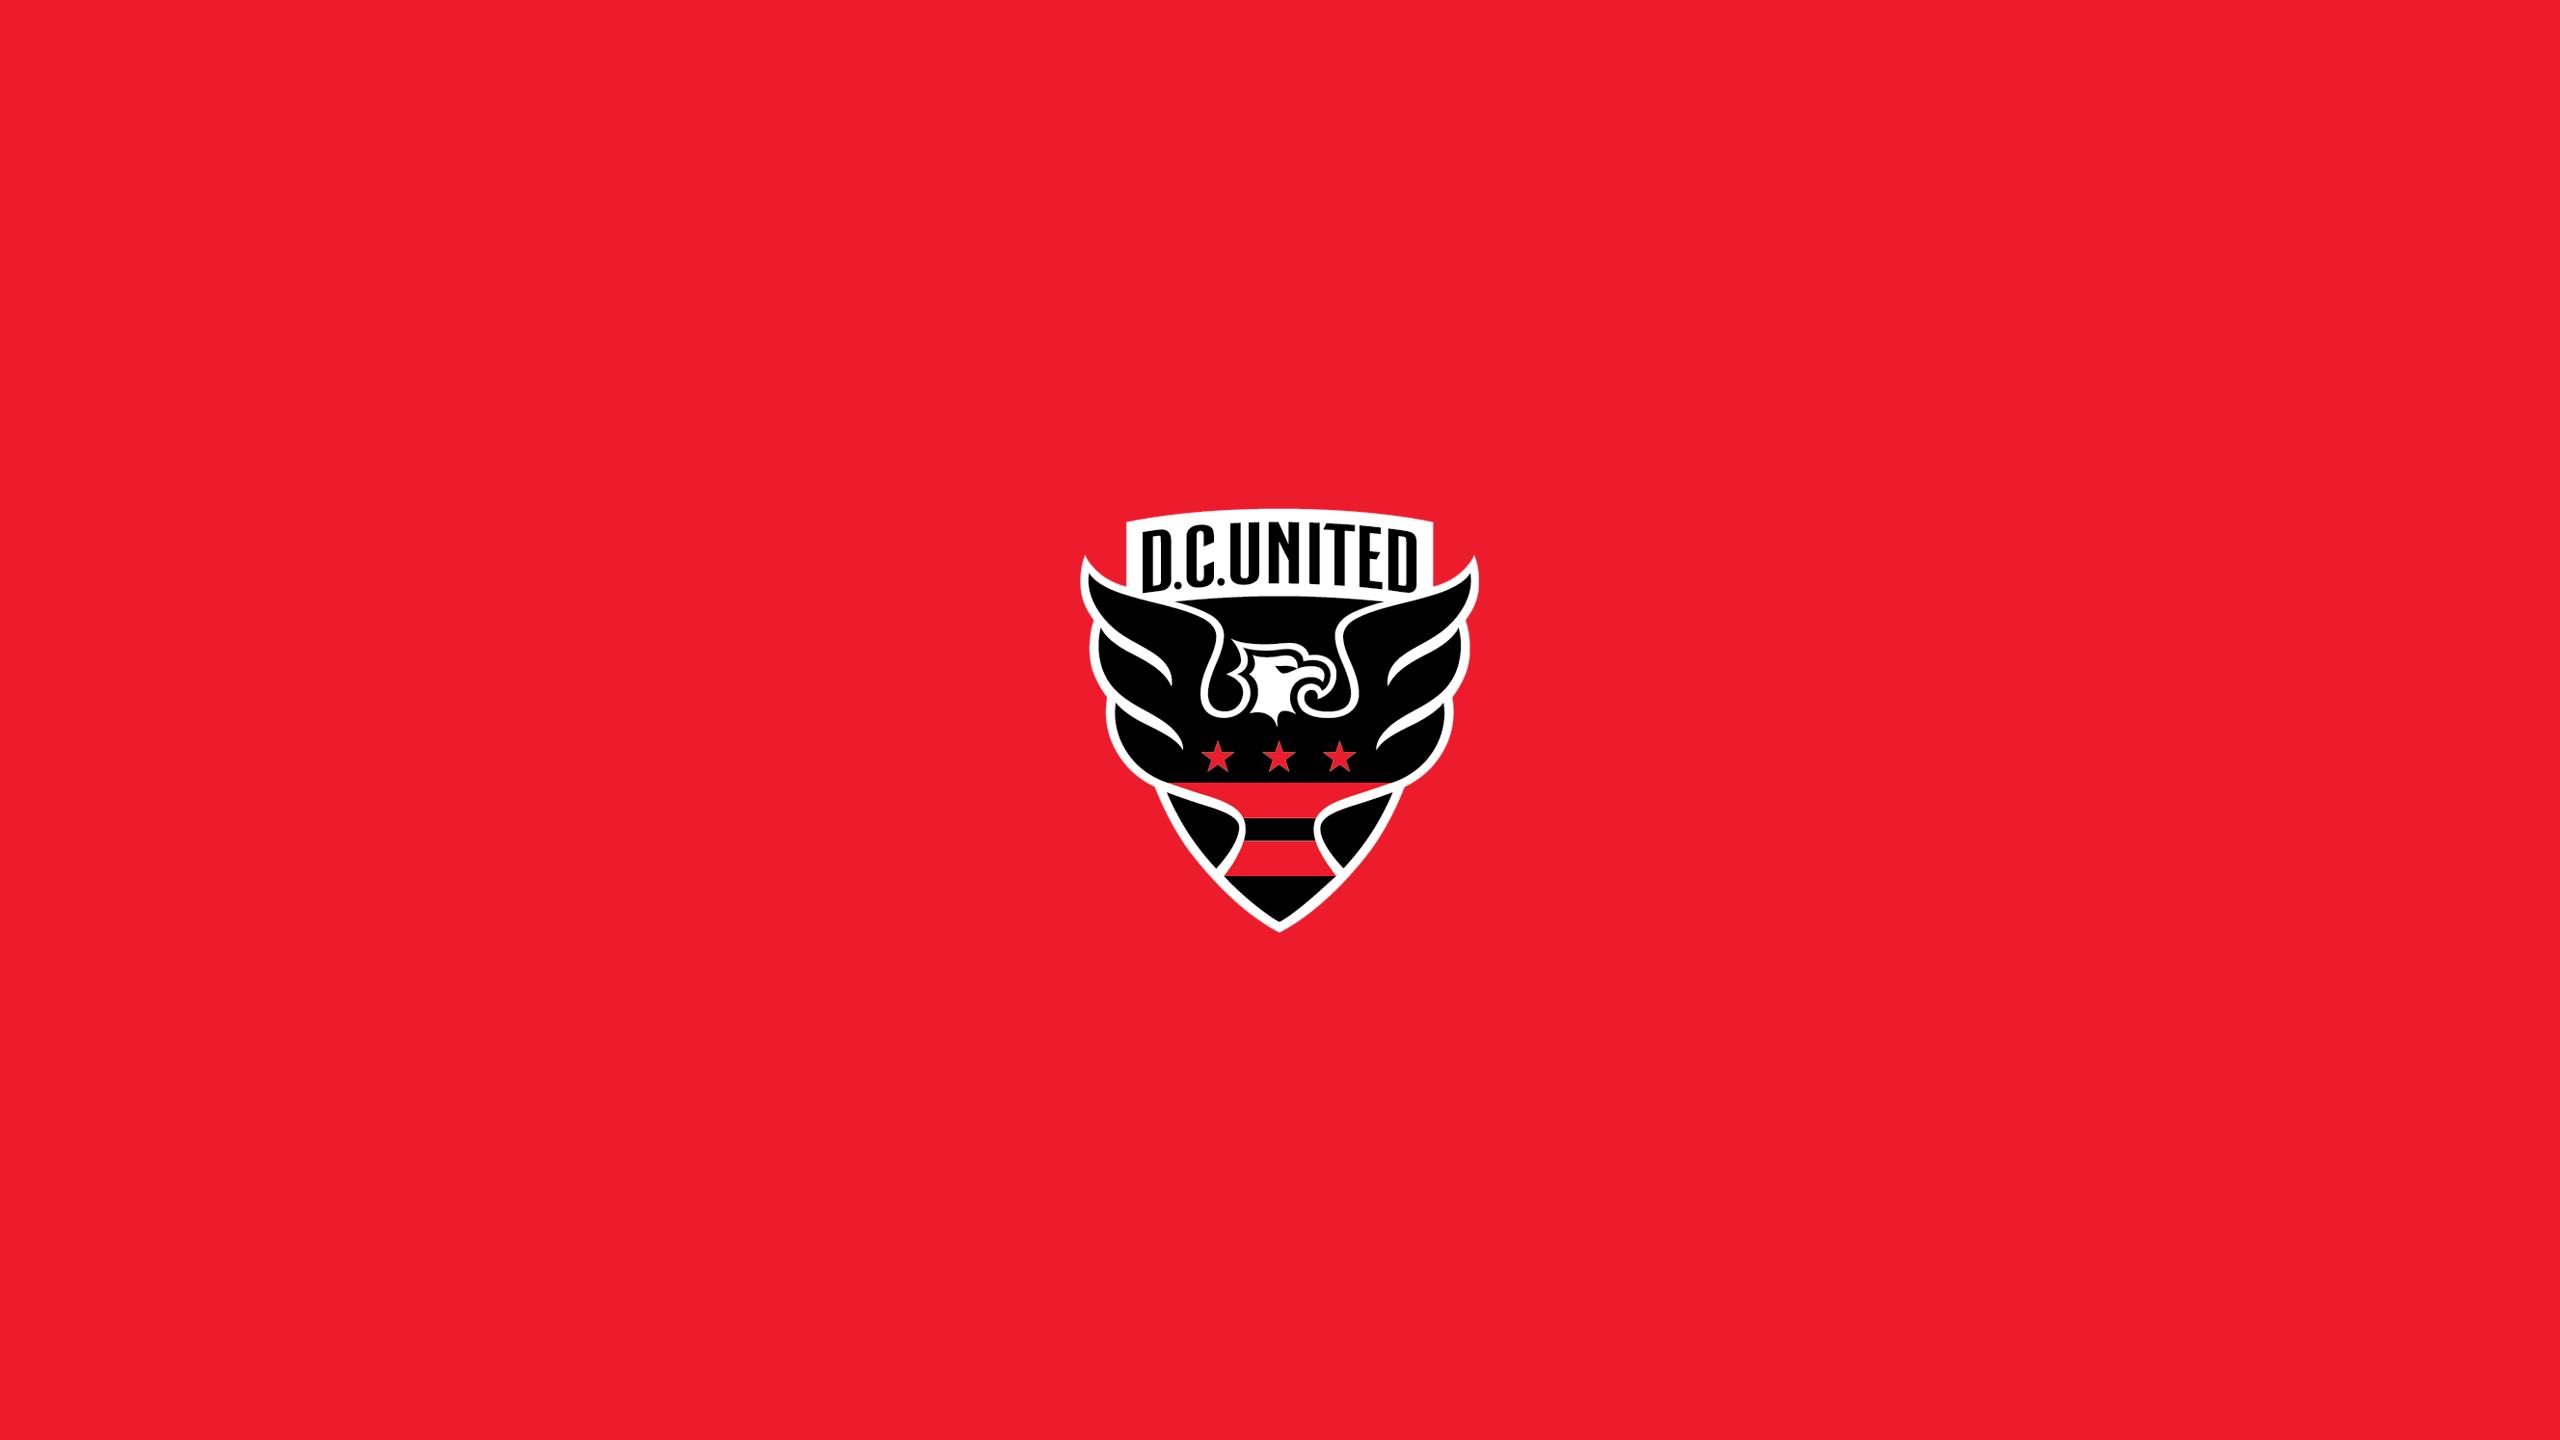 MLS D C United Logo Red wallpaper 2018 in Soccer 2560x1440